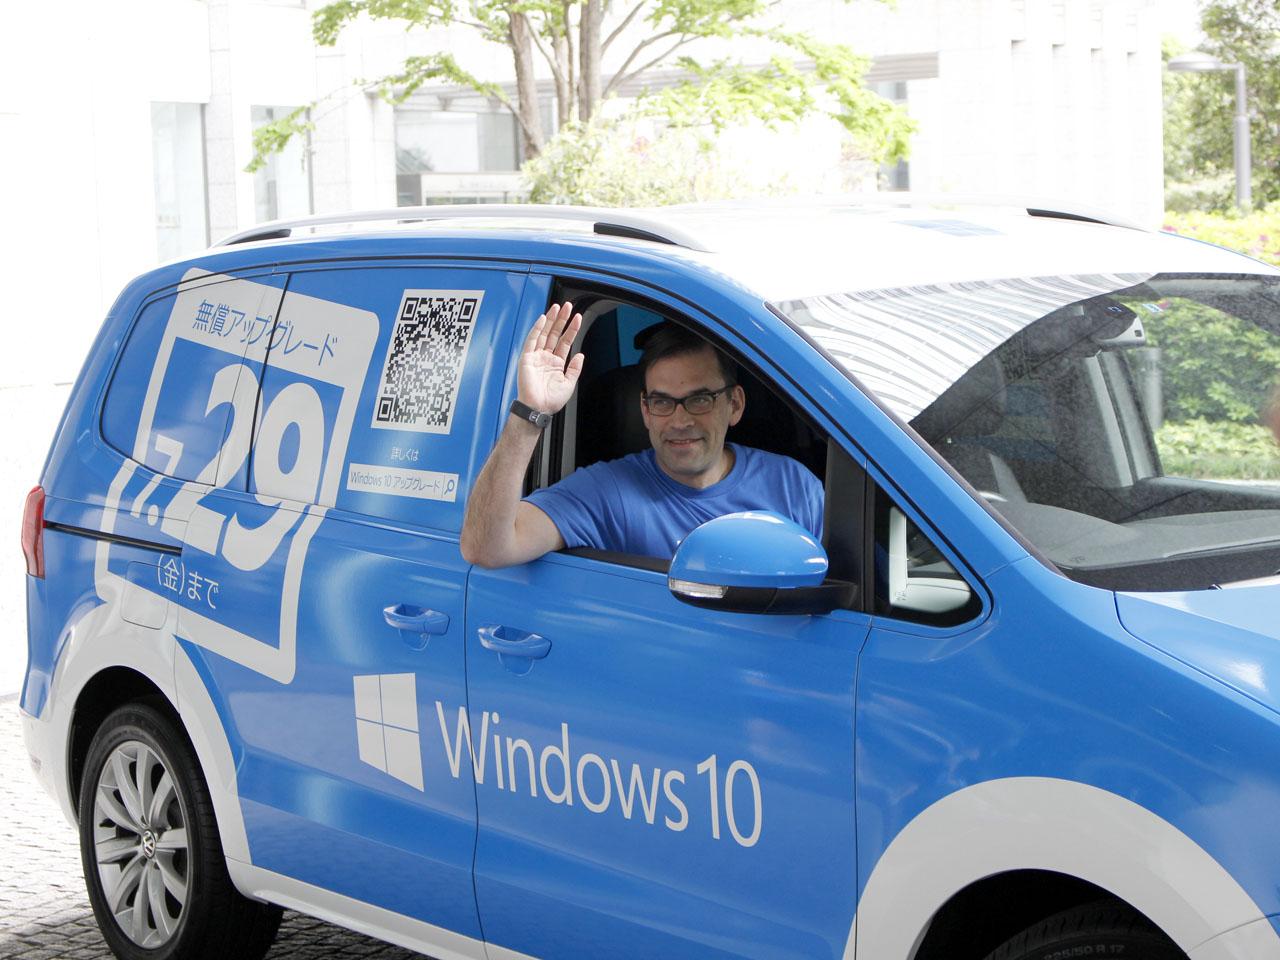 Windows 10無償アップグレード終了を告知するキャラバンカーと平野氏